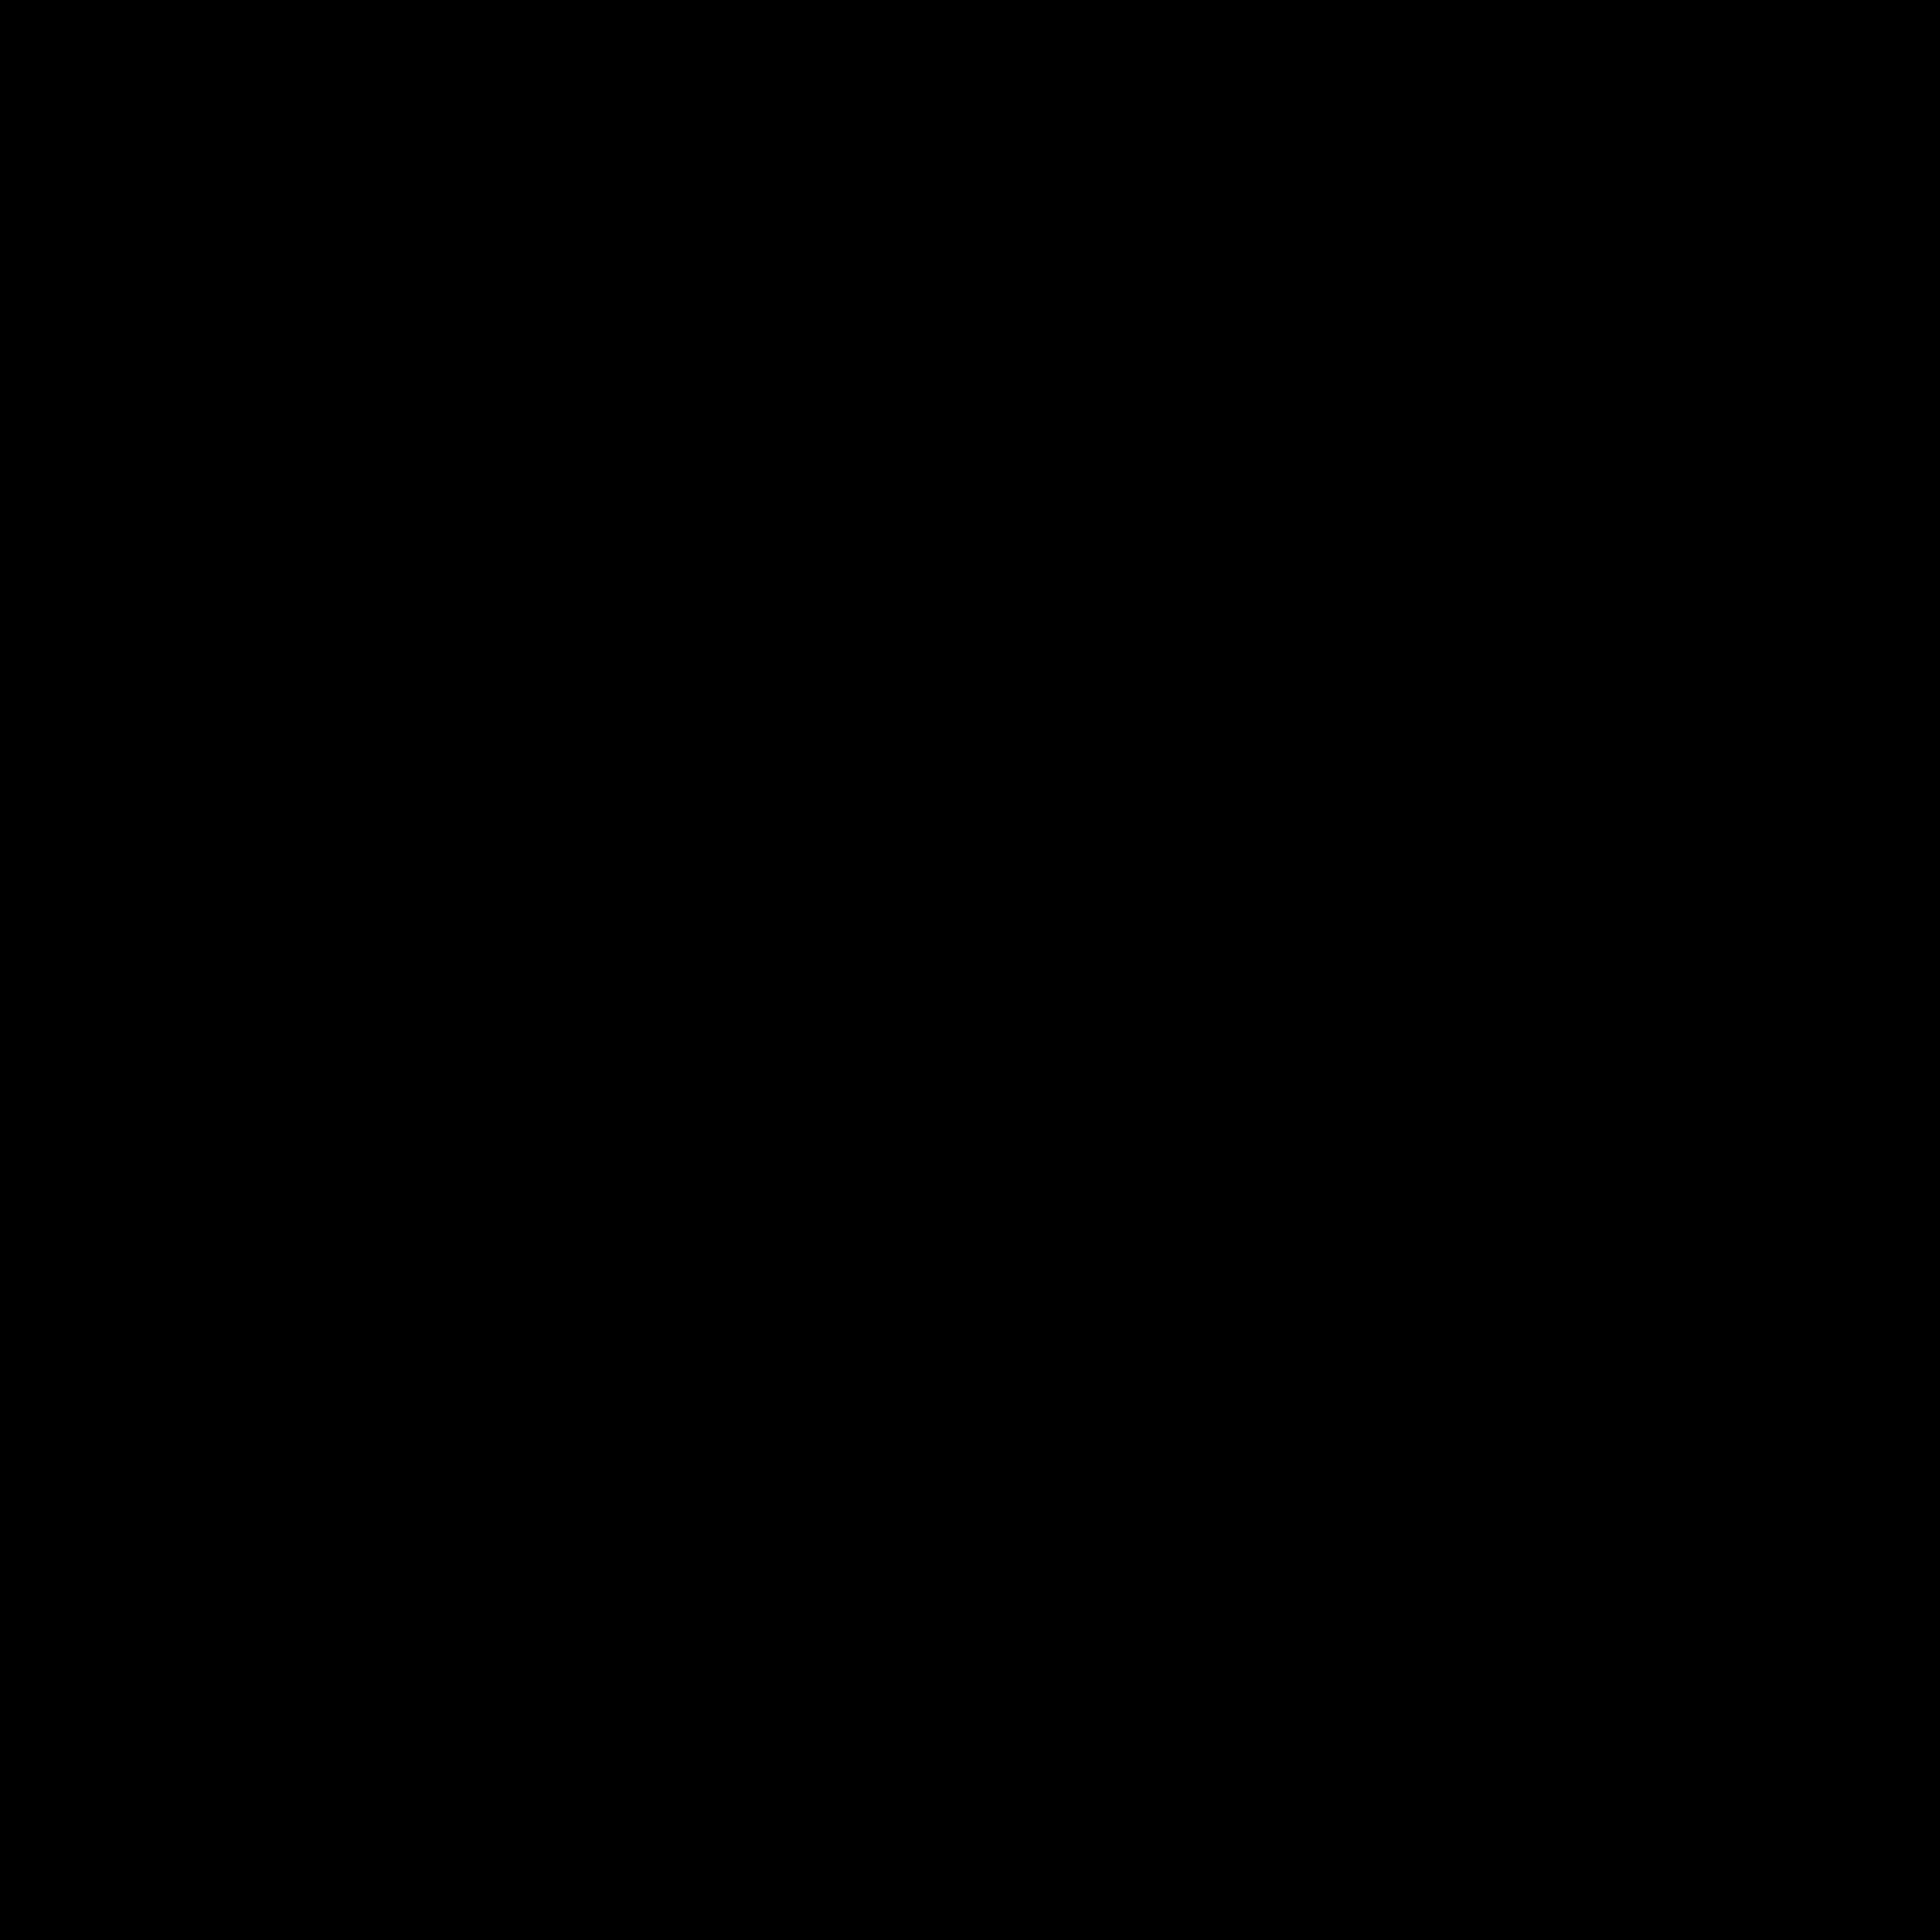 Greyhound Bus Lines Logo Png Transparent Svg Vector Freebie Supply